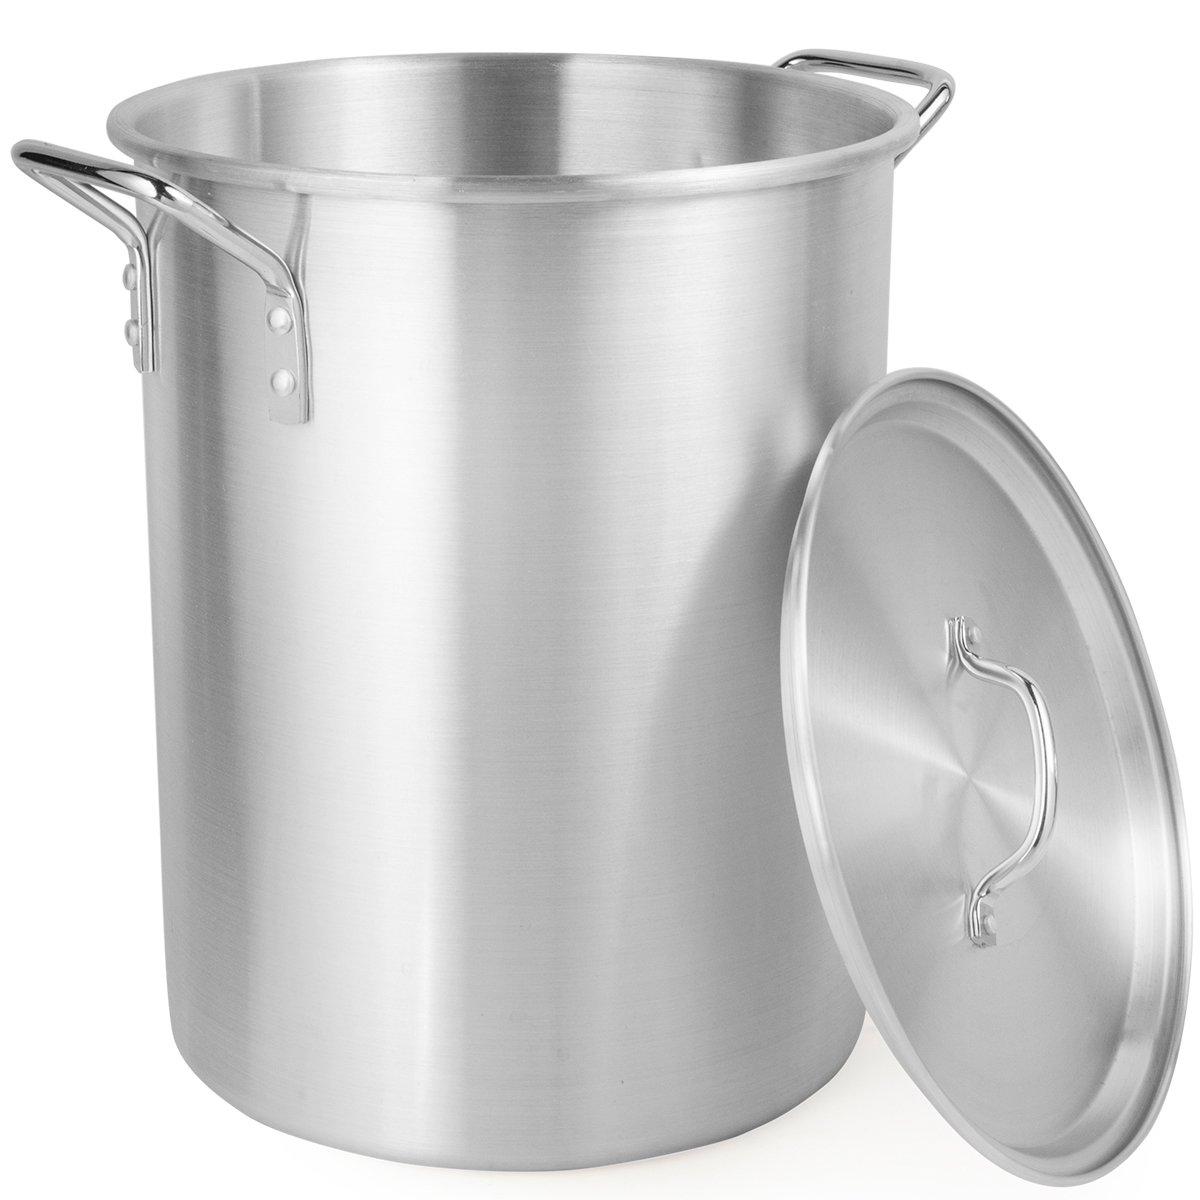 Amazon.com: 30 QT Aluminum Turkey Deep Fryer Pot and Gas Stove Burner Stand, 6 Pc Set: Home & Kitchen